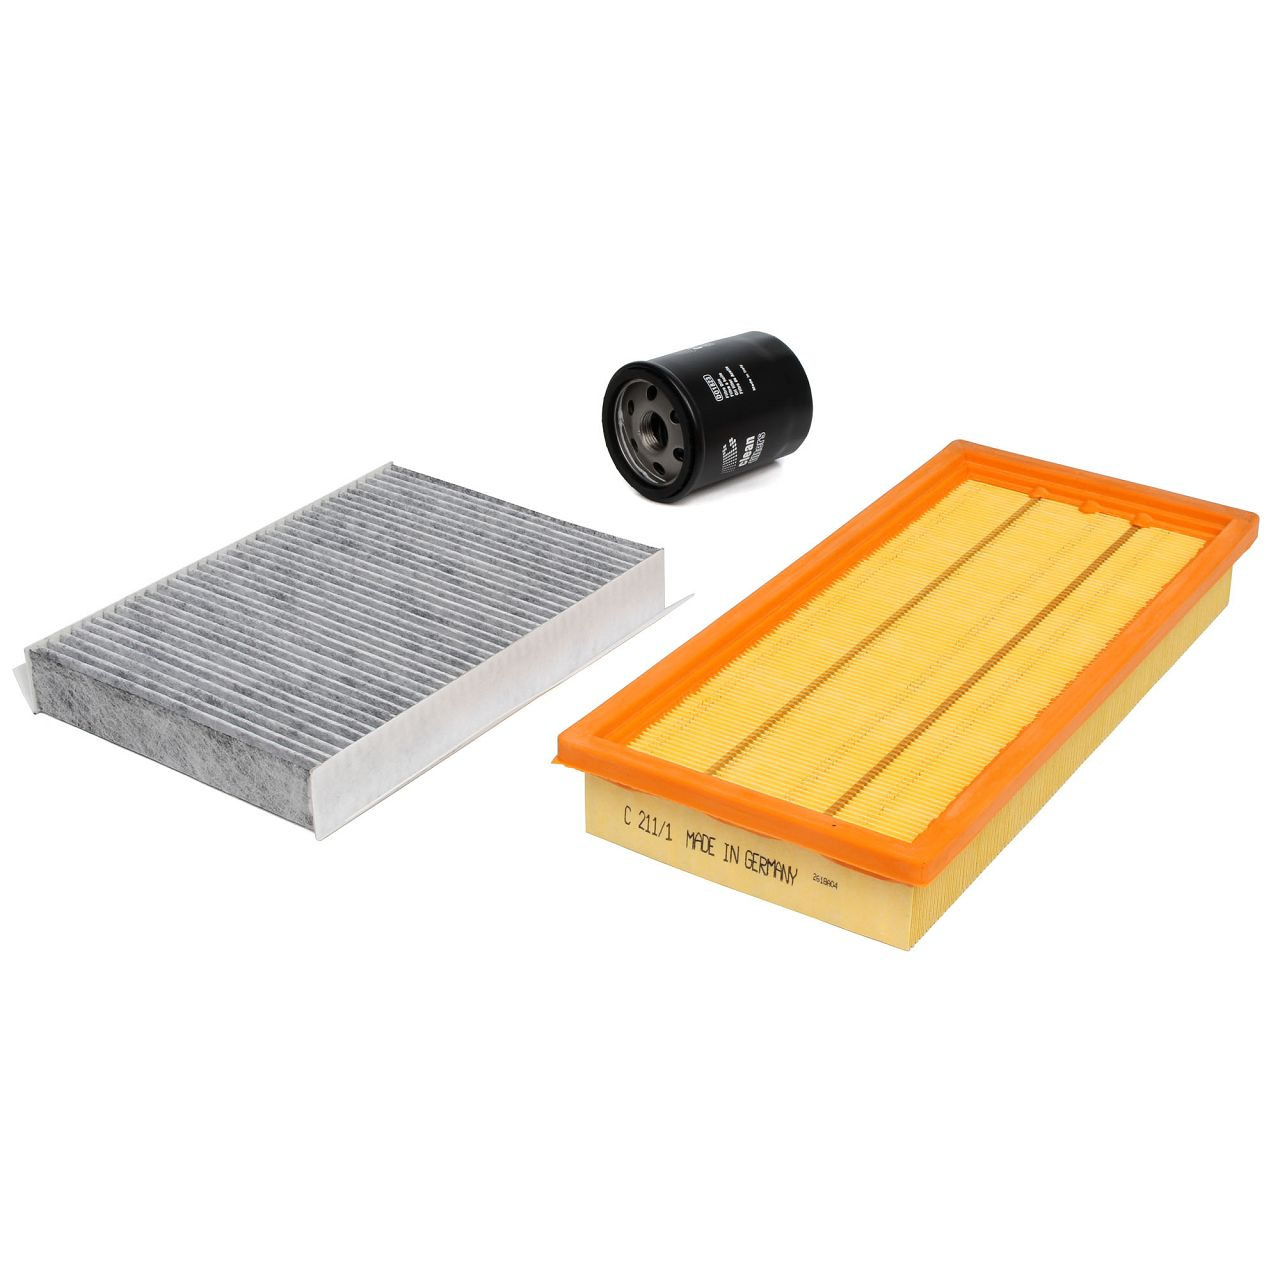 Inspektionskit Filterpaket Filterset für FIAT 500L (351_, 352_) 1.4 95 PS